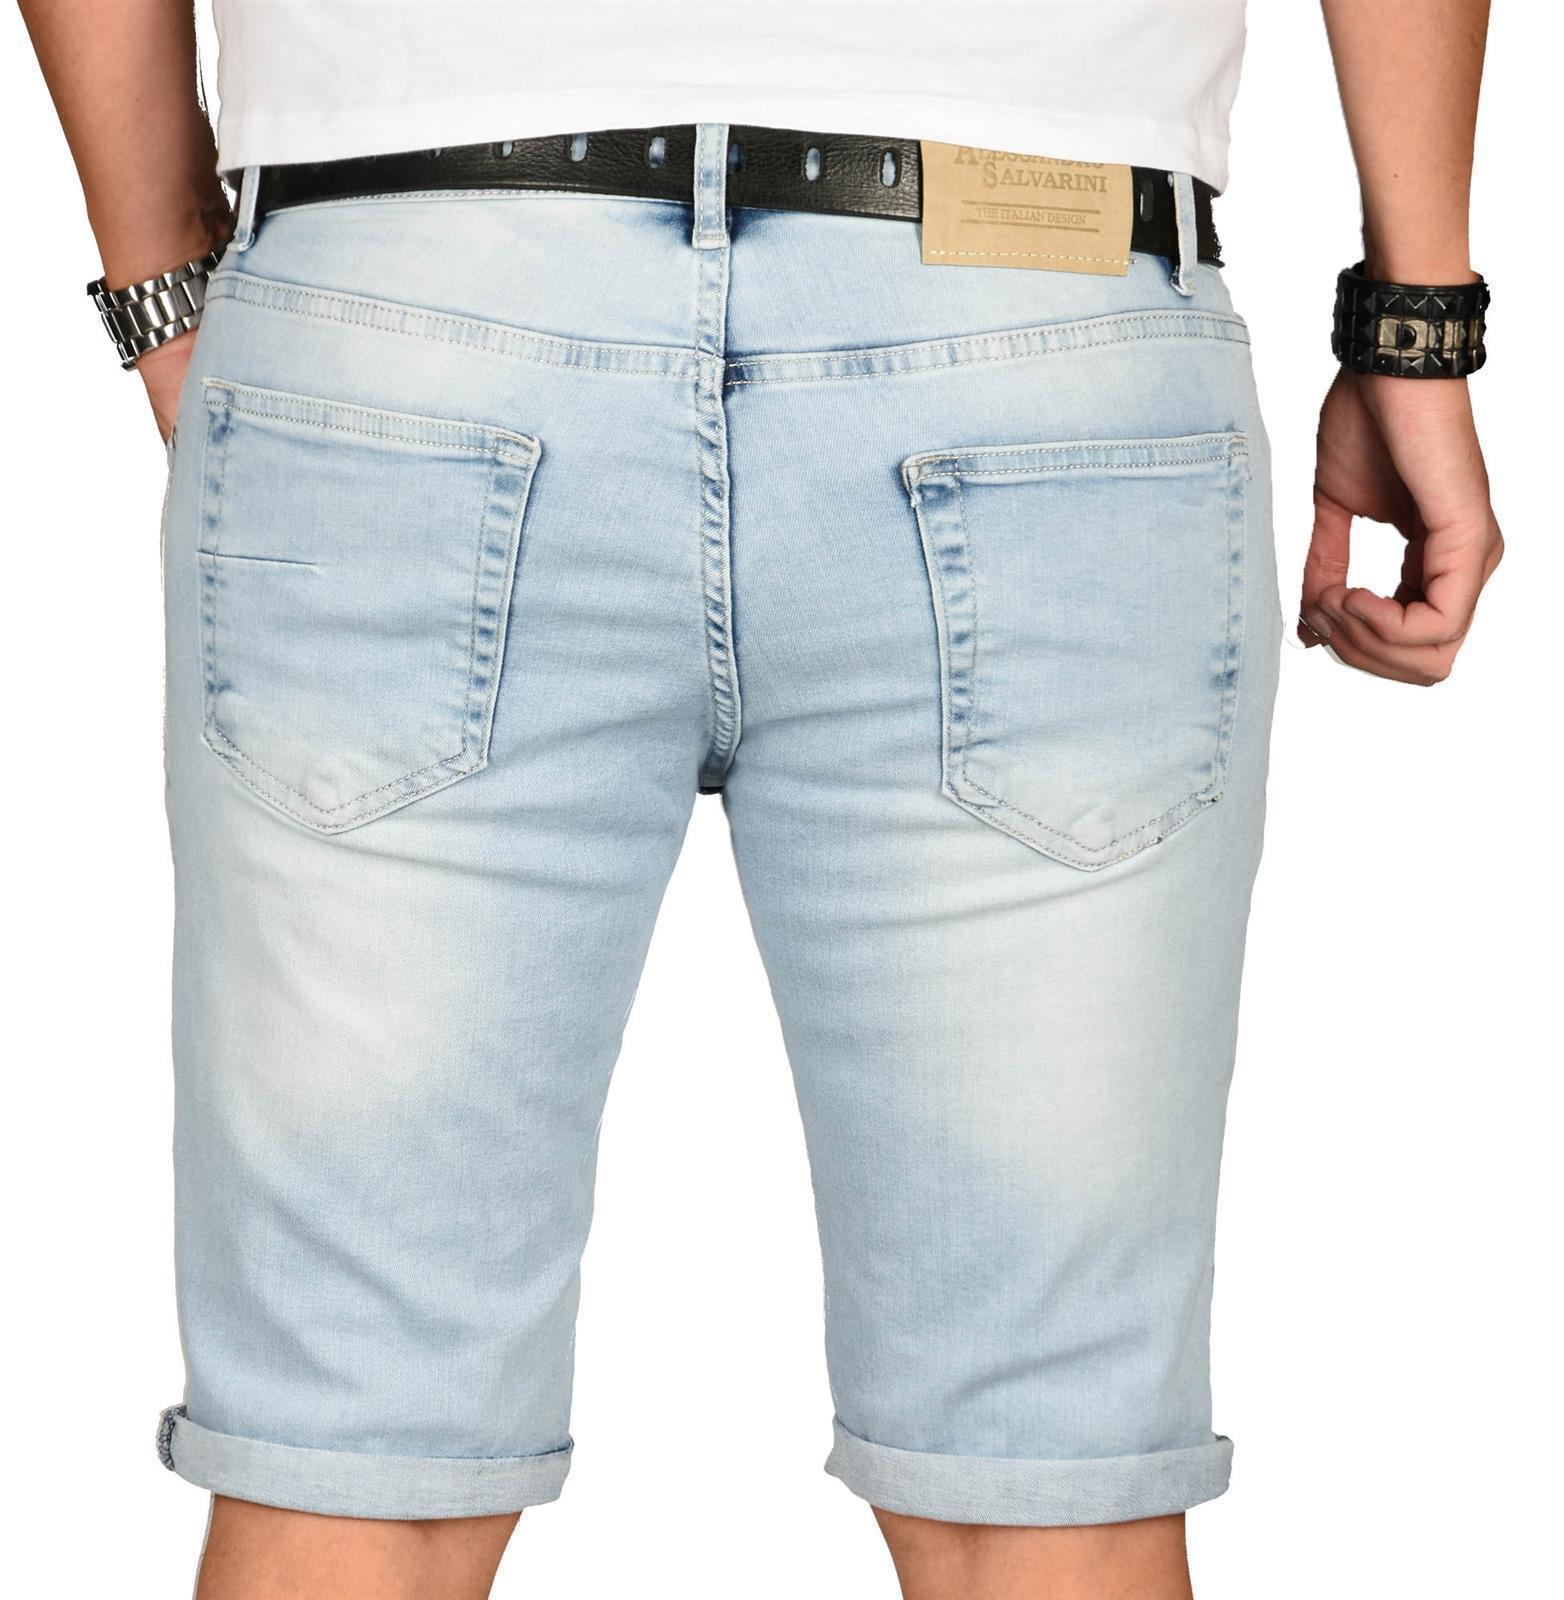 A-Salvarini-Herren-Designer-Jeans-Short-kurze-Hose-Slim-Sommer-Shorts-Washed Indexbild 9